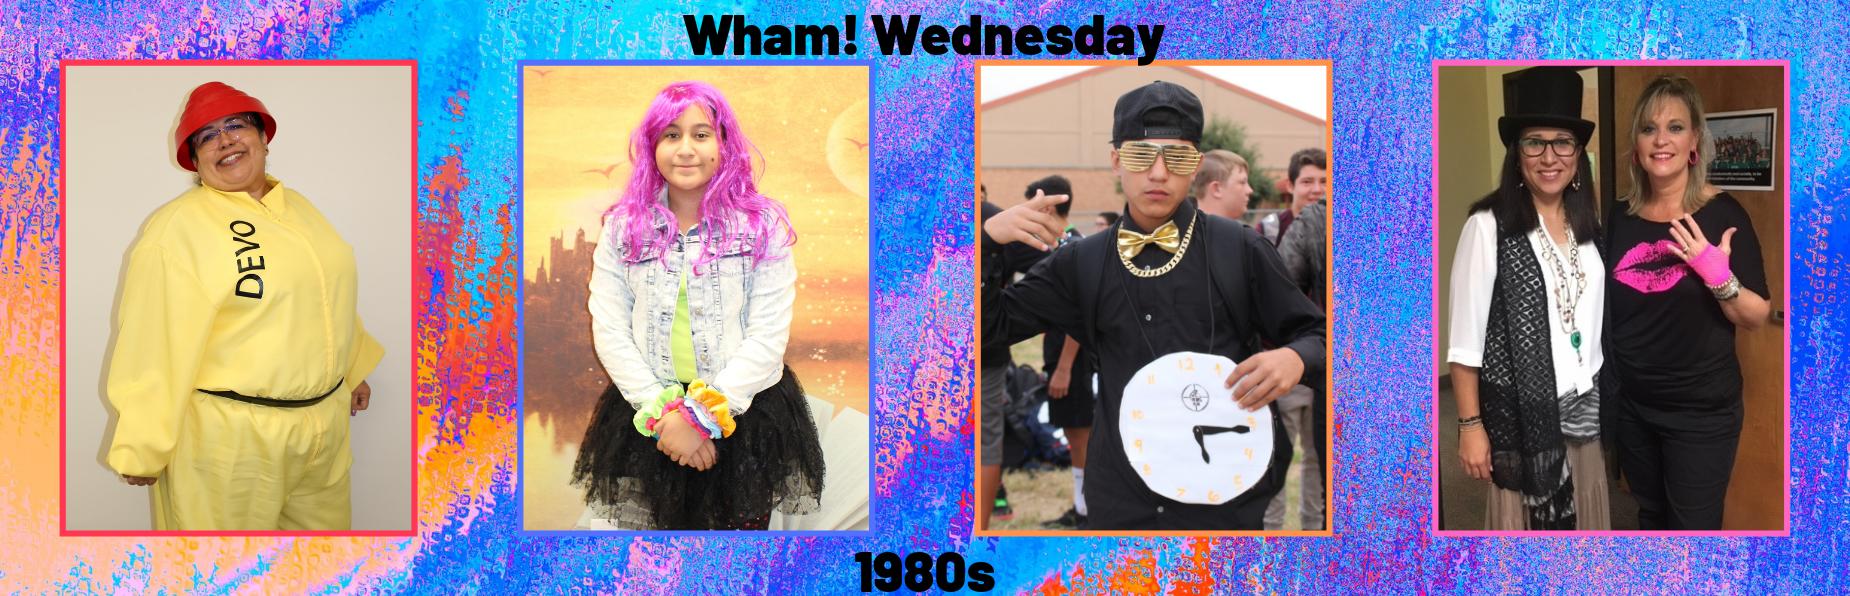 Wham! Wednesday